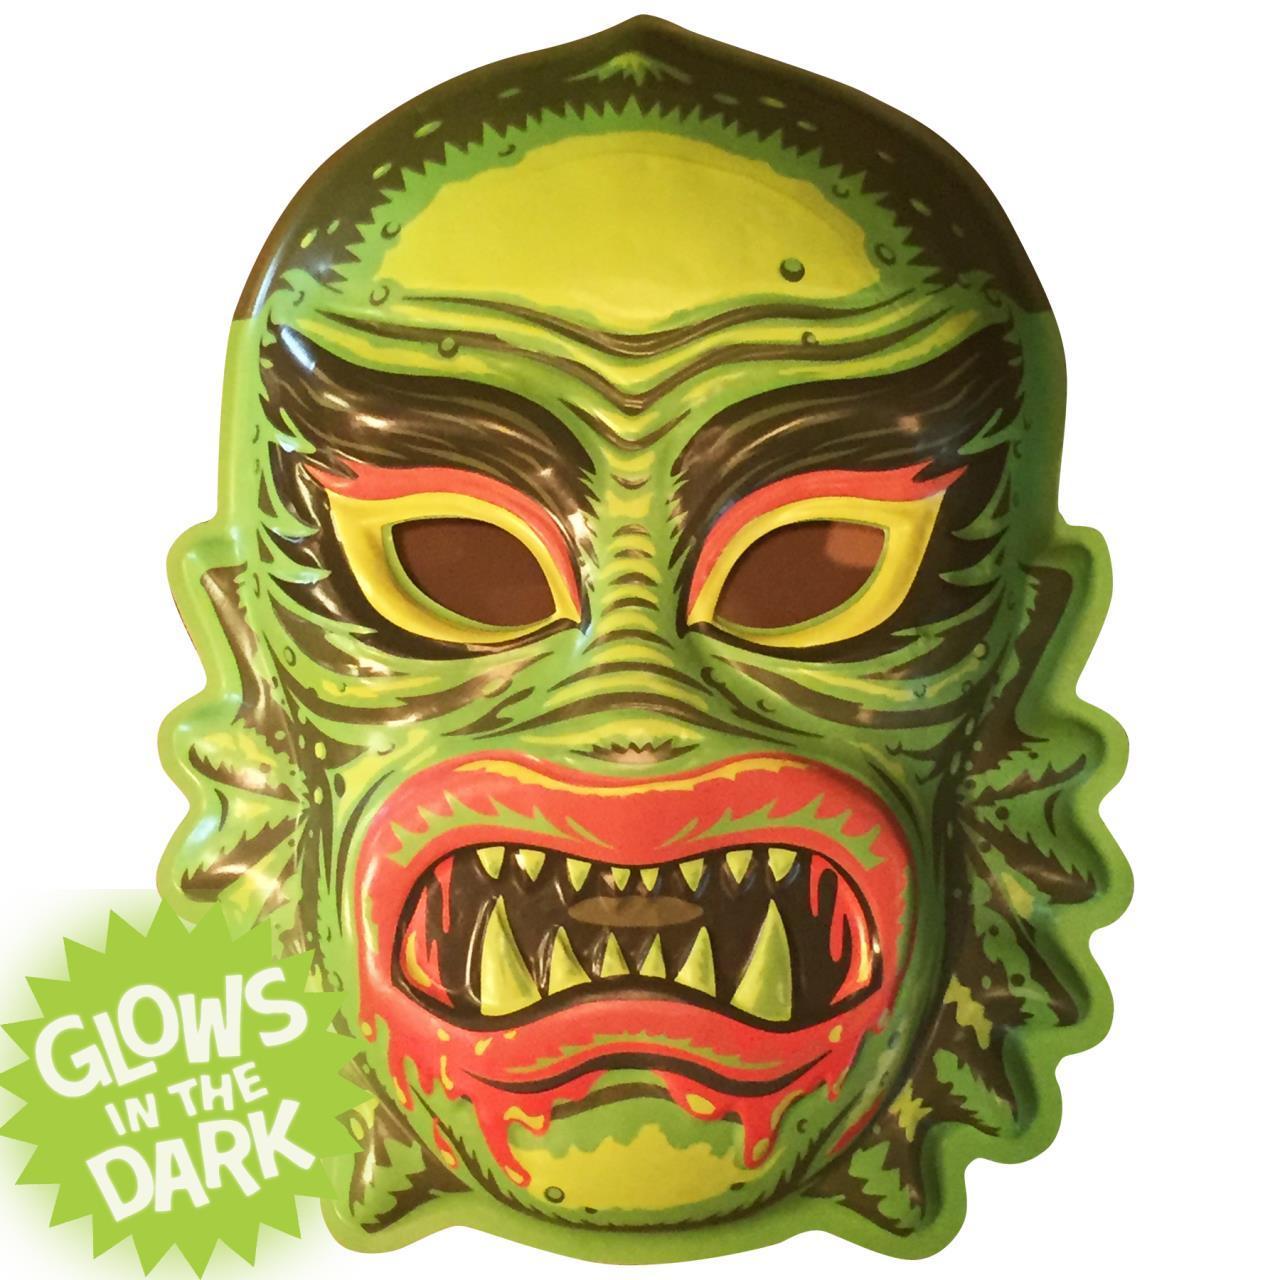 Fish Face Vac-tastic Plastic Mask Wall Decor-RETIRED ...